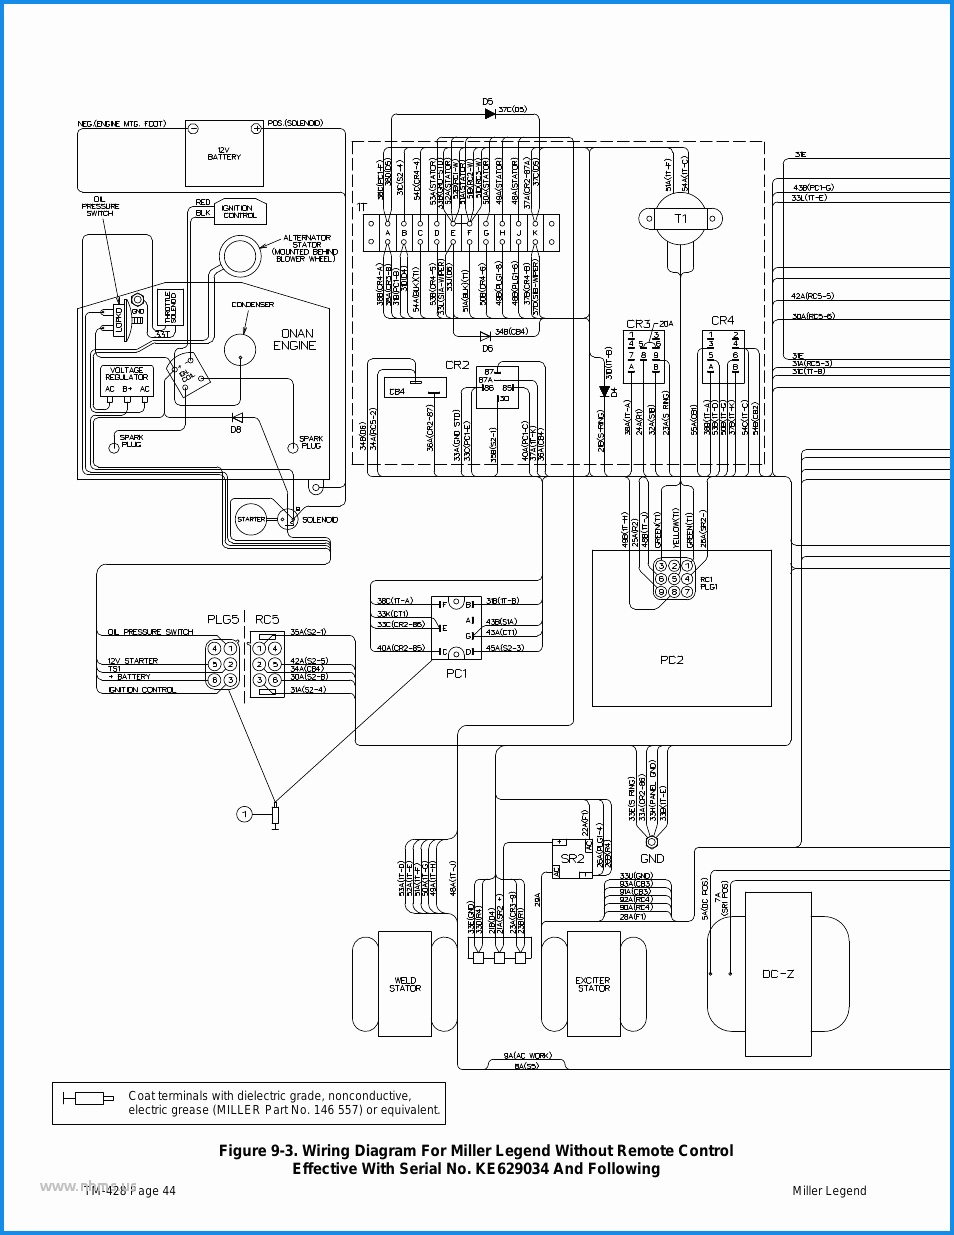 Nordyne Wiring Diagram Feha 015Ha 01 | Wiring Diagram - Nordyne E2Eb 015Ha Wiring Diagram